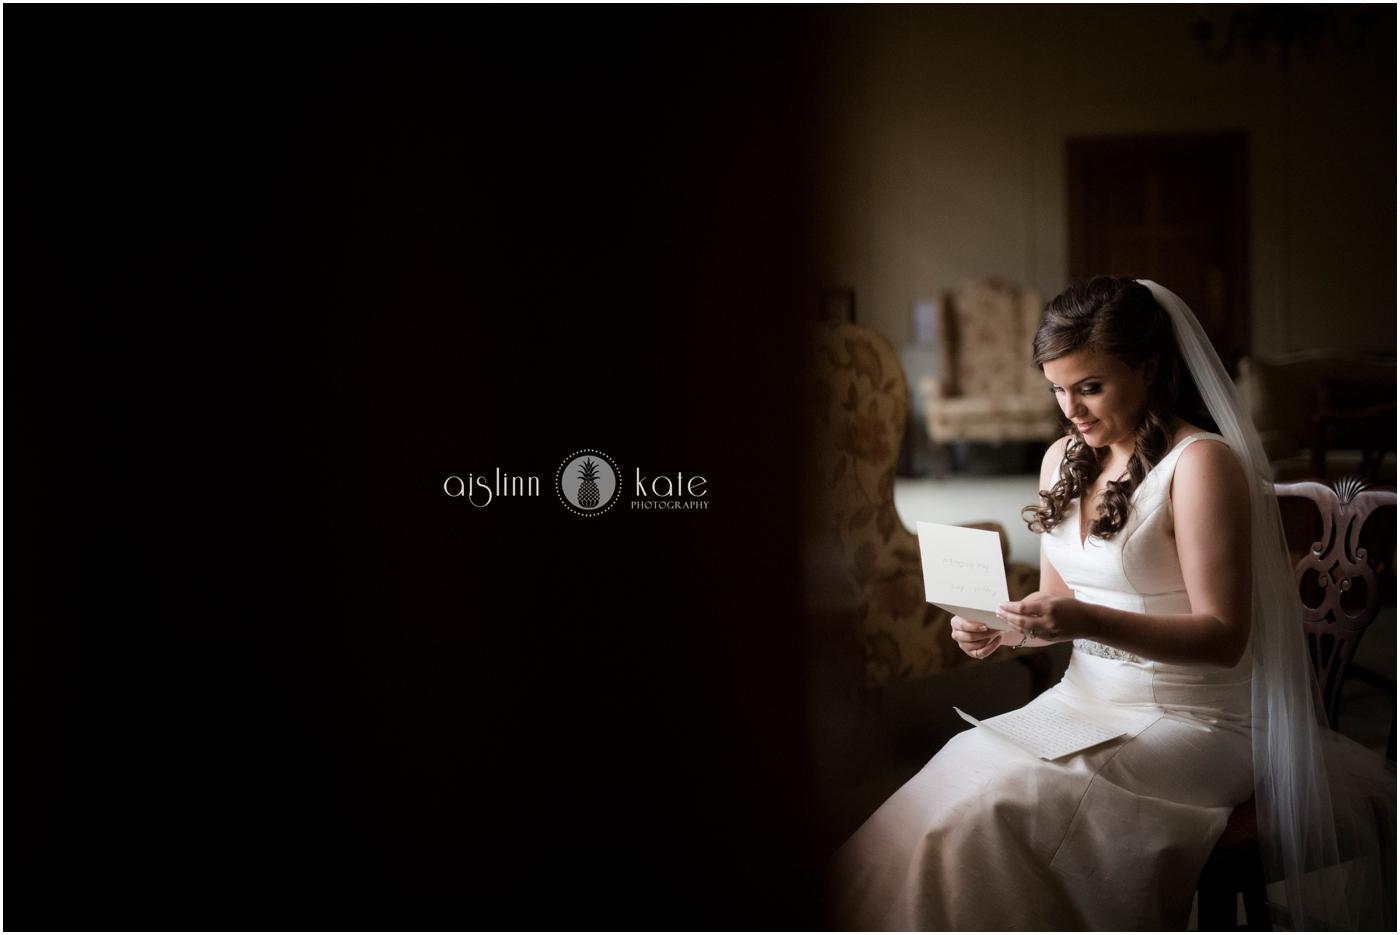 f02a92b6d54 Pensacola-Destin-Wedding-Photographer 9838.jpg